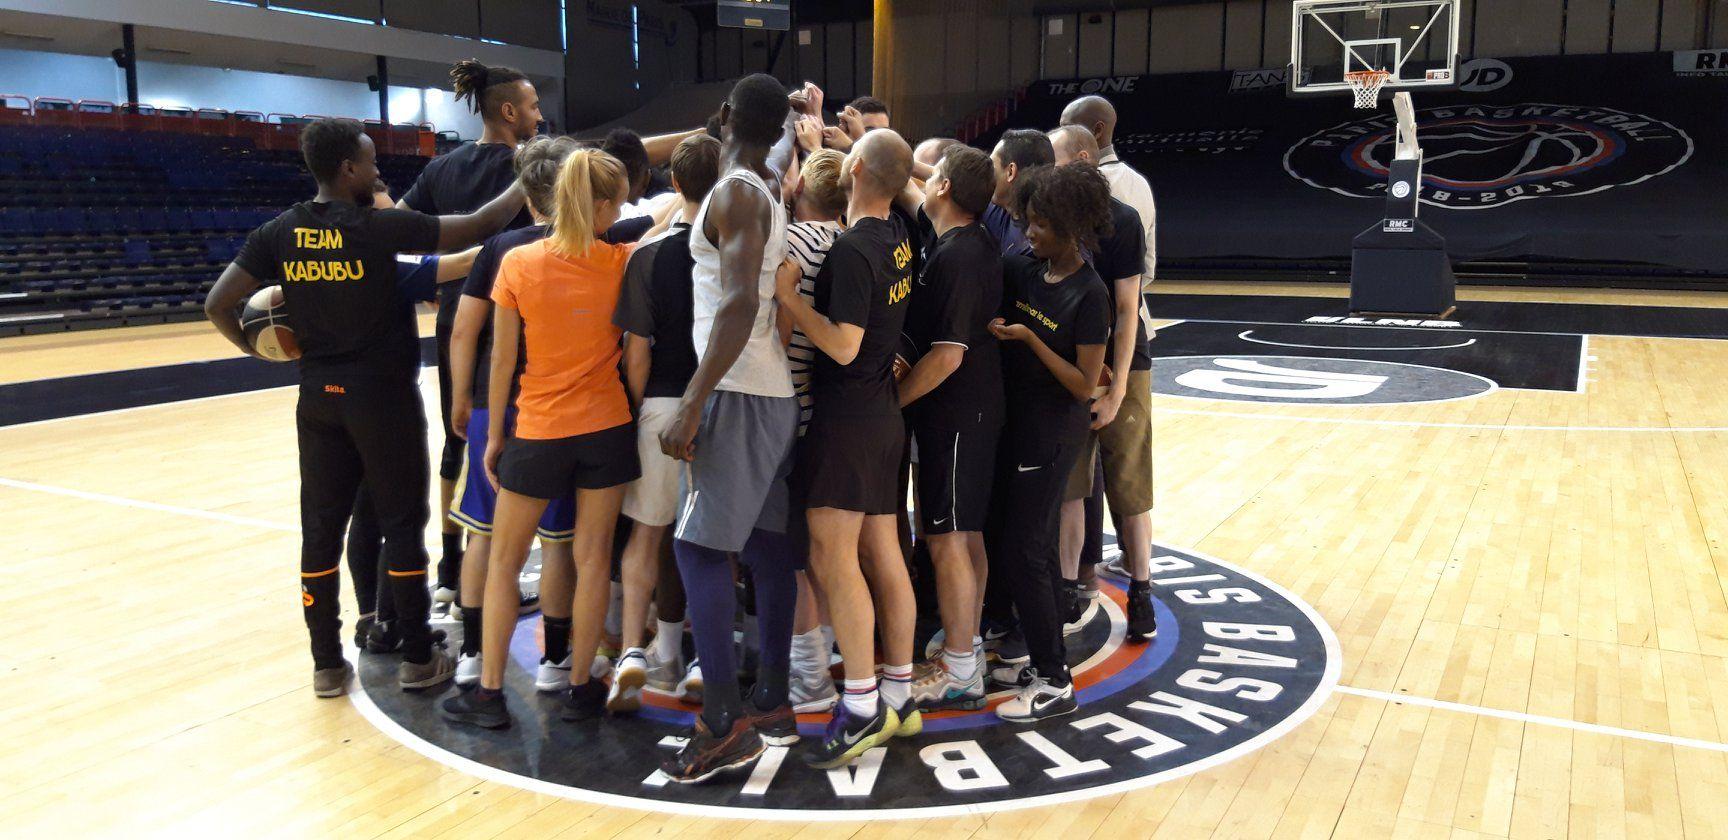 PARIS - Basketball